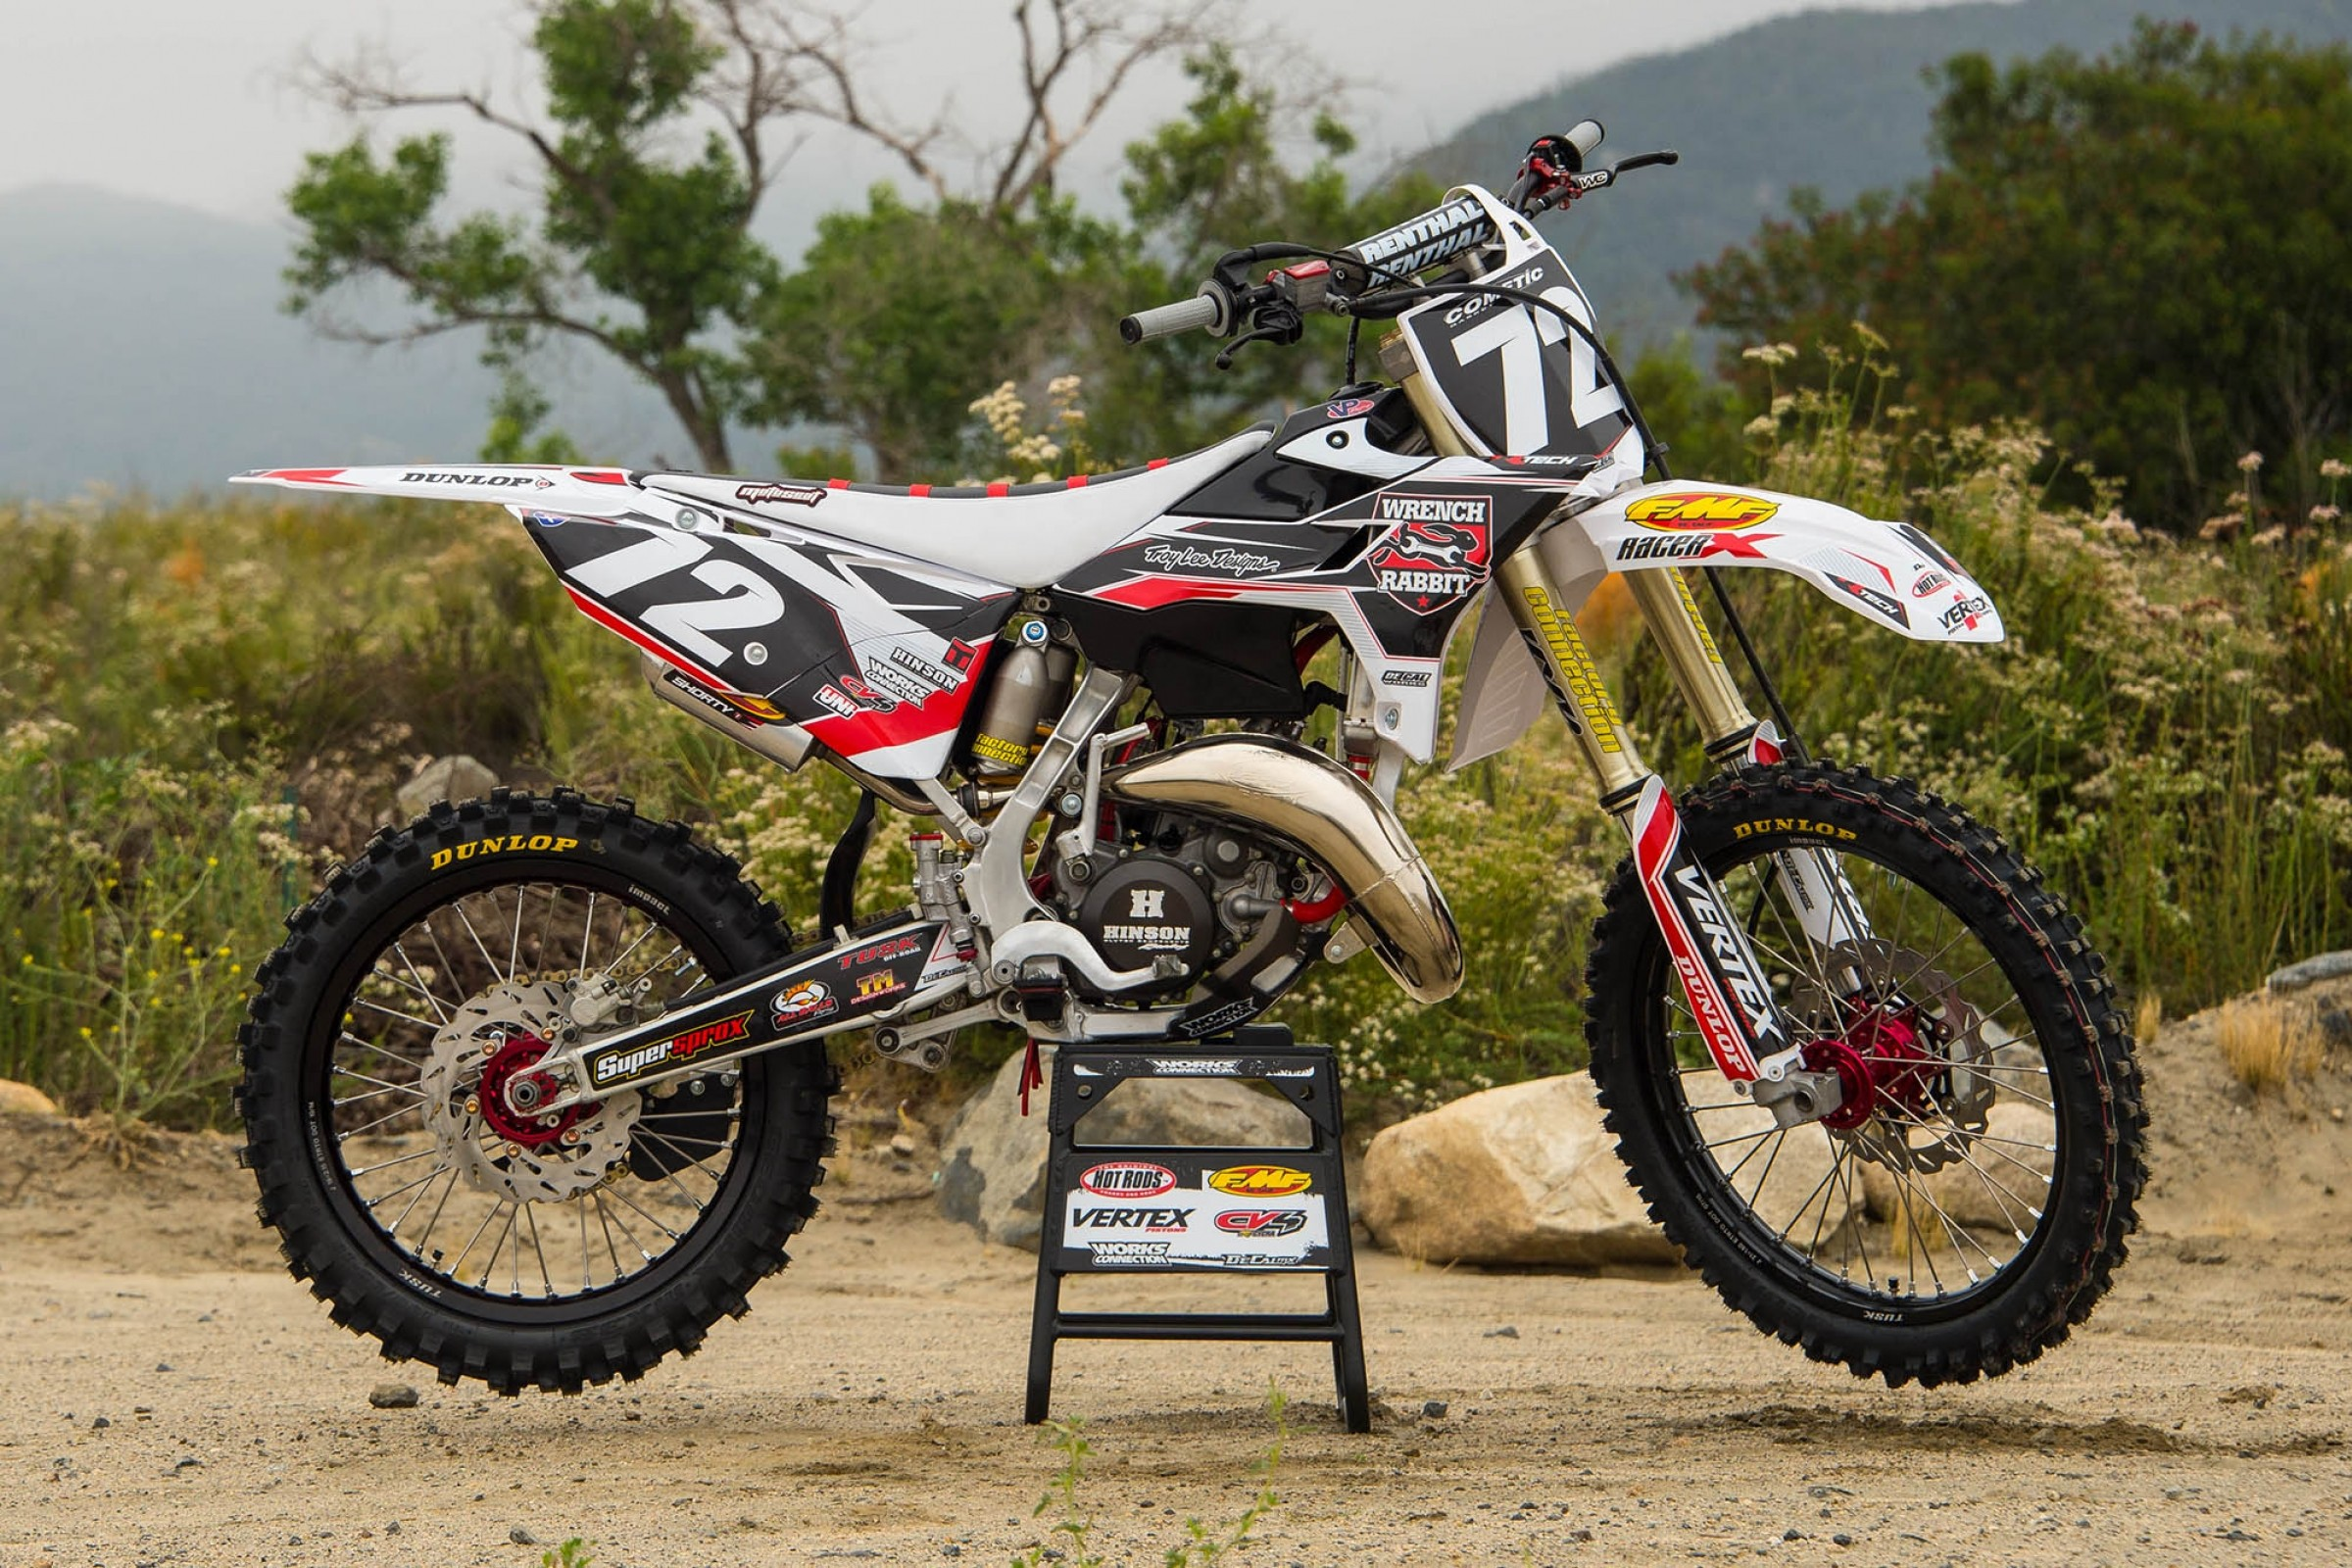 Racer X Films: Garage Build 2005 Yamaha YZ125 - Racer X Online